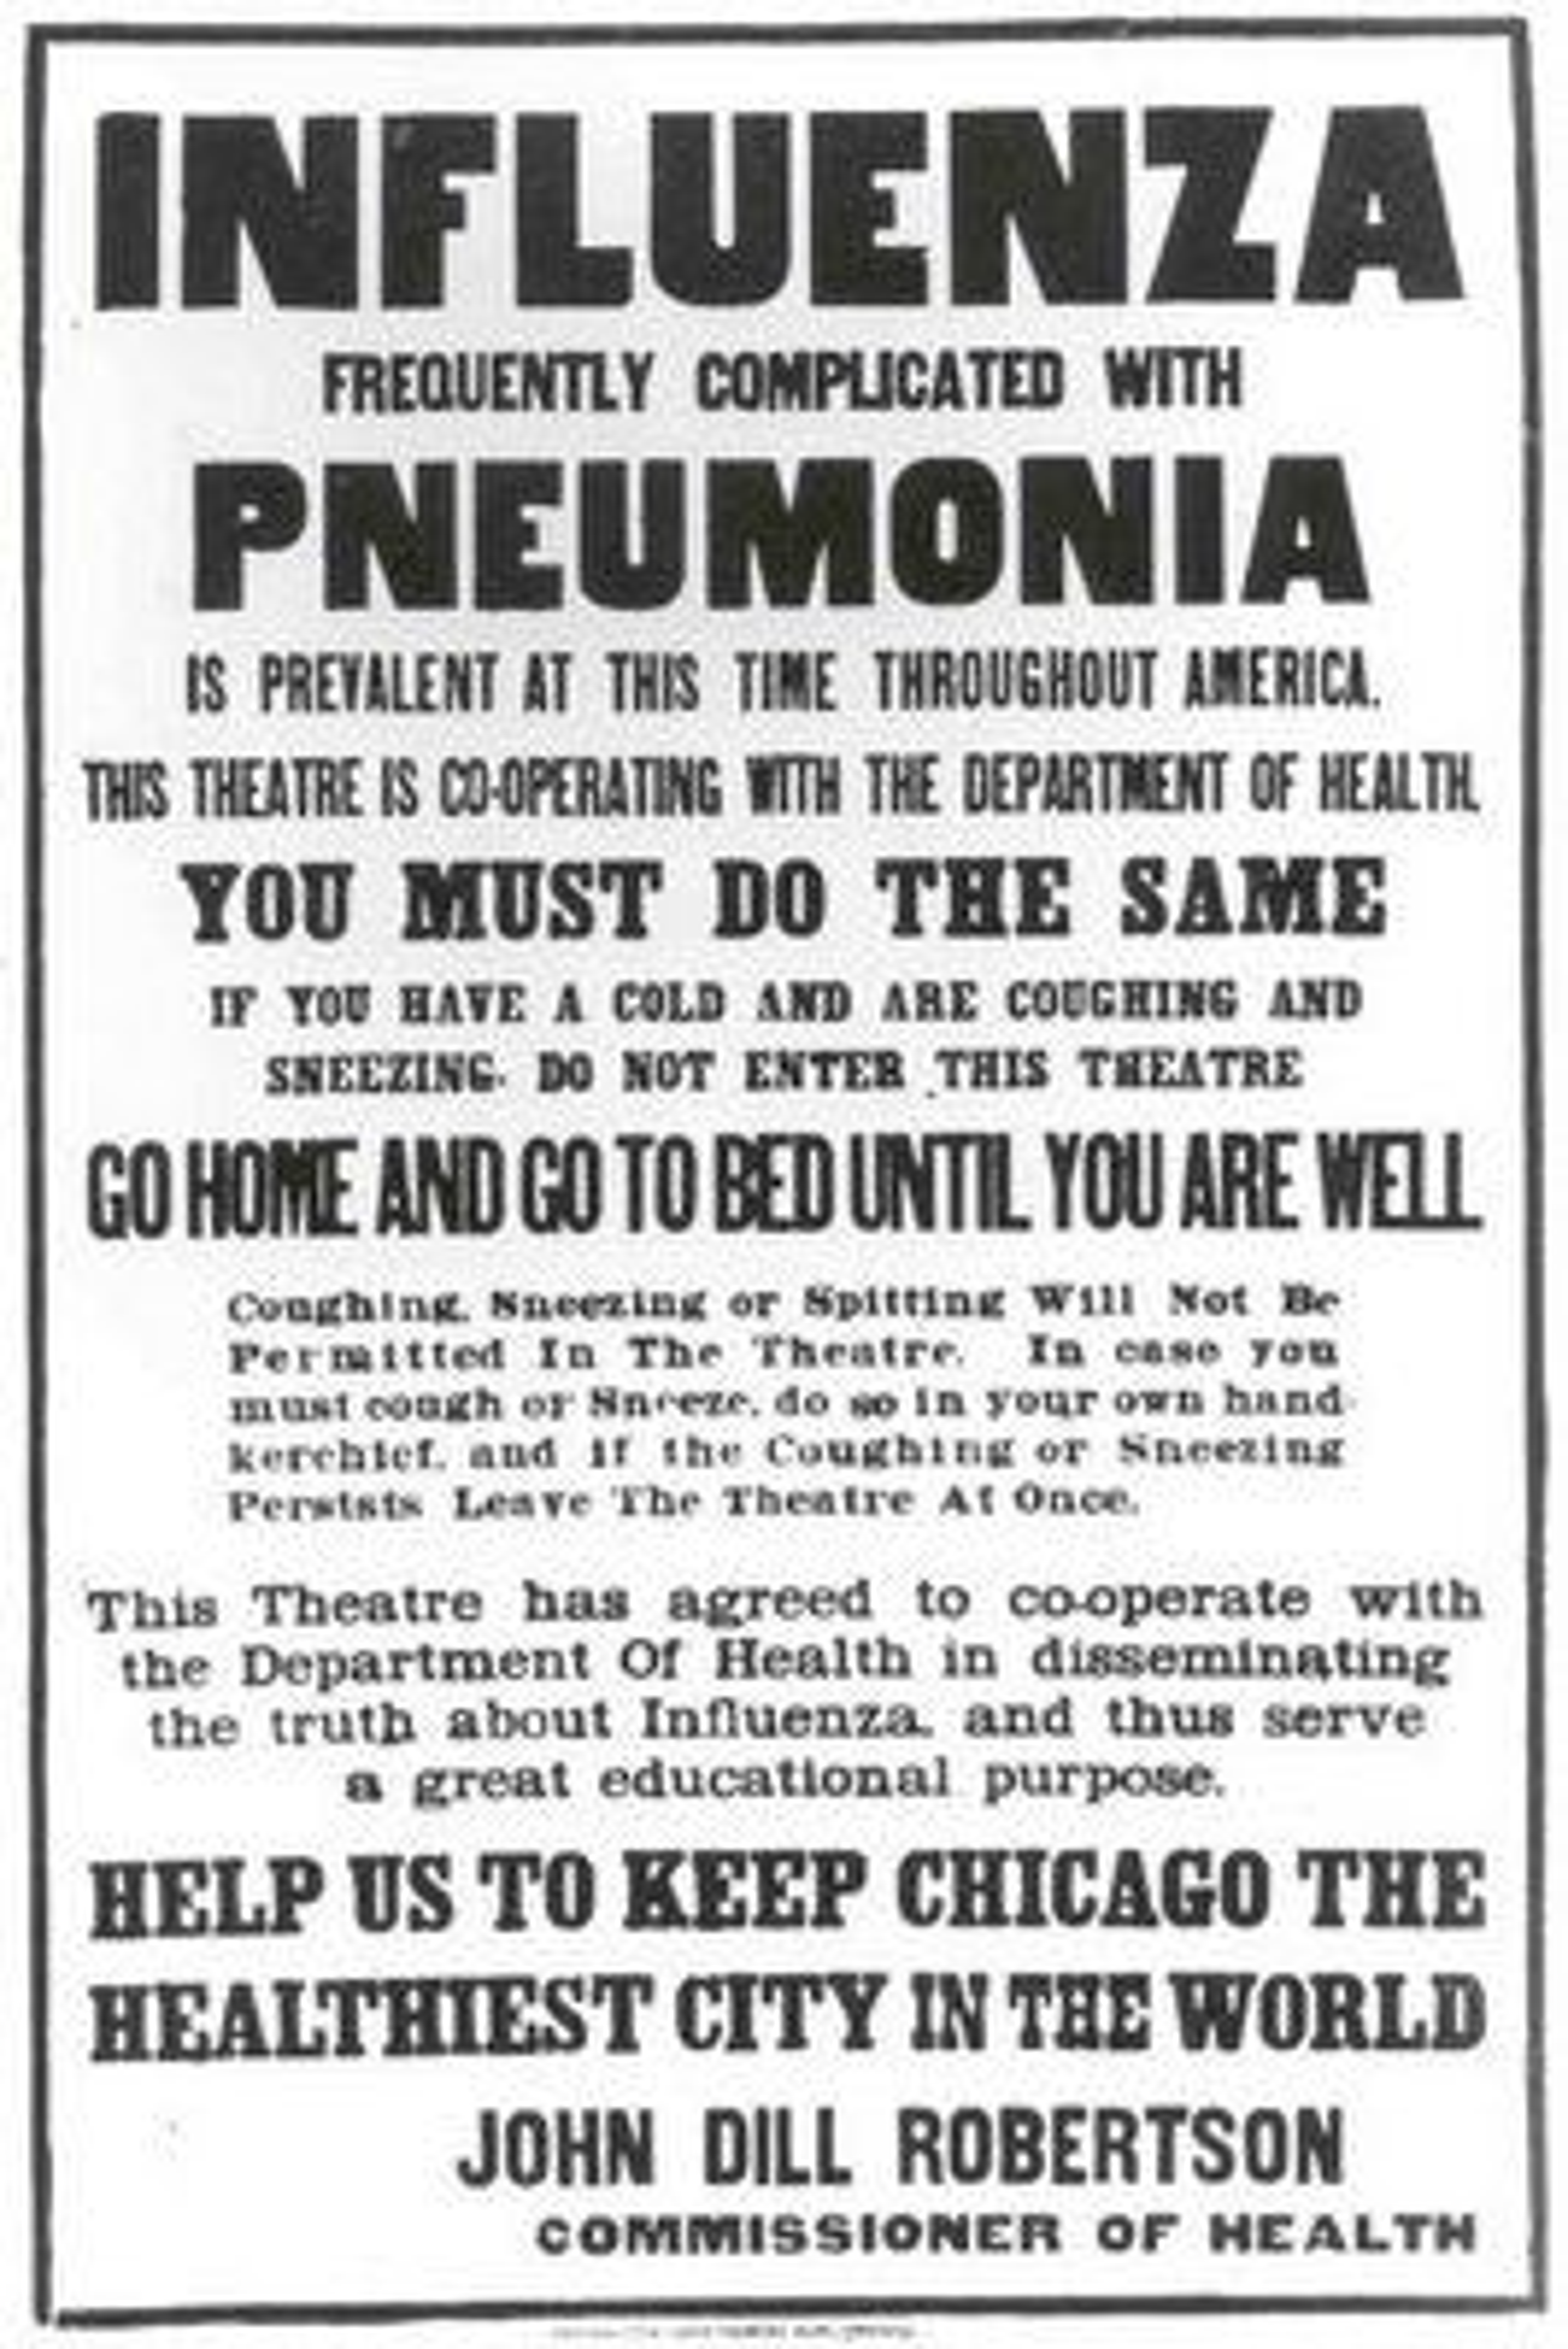 A Chicago Public Health poster outlines flu regulations during the  pandemic. origins.osu.edu